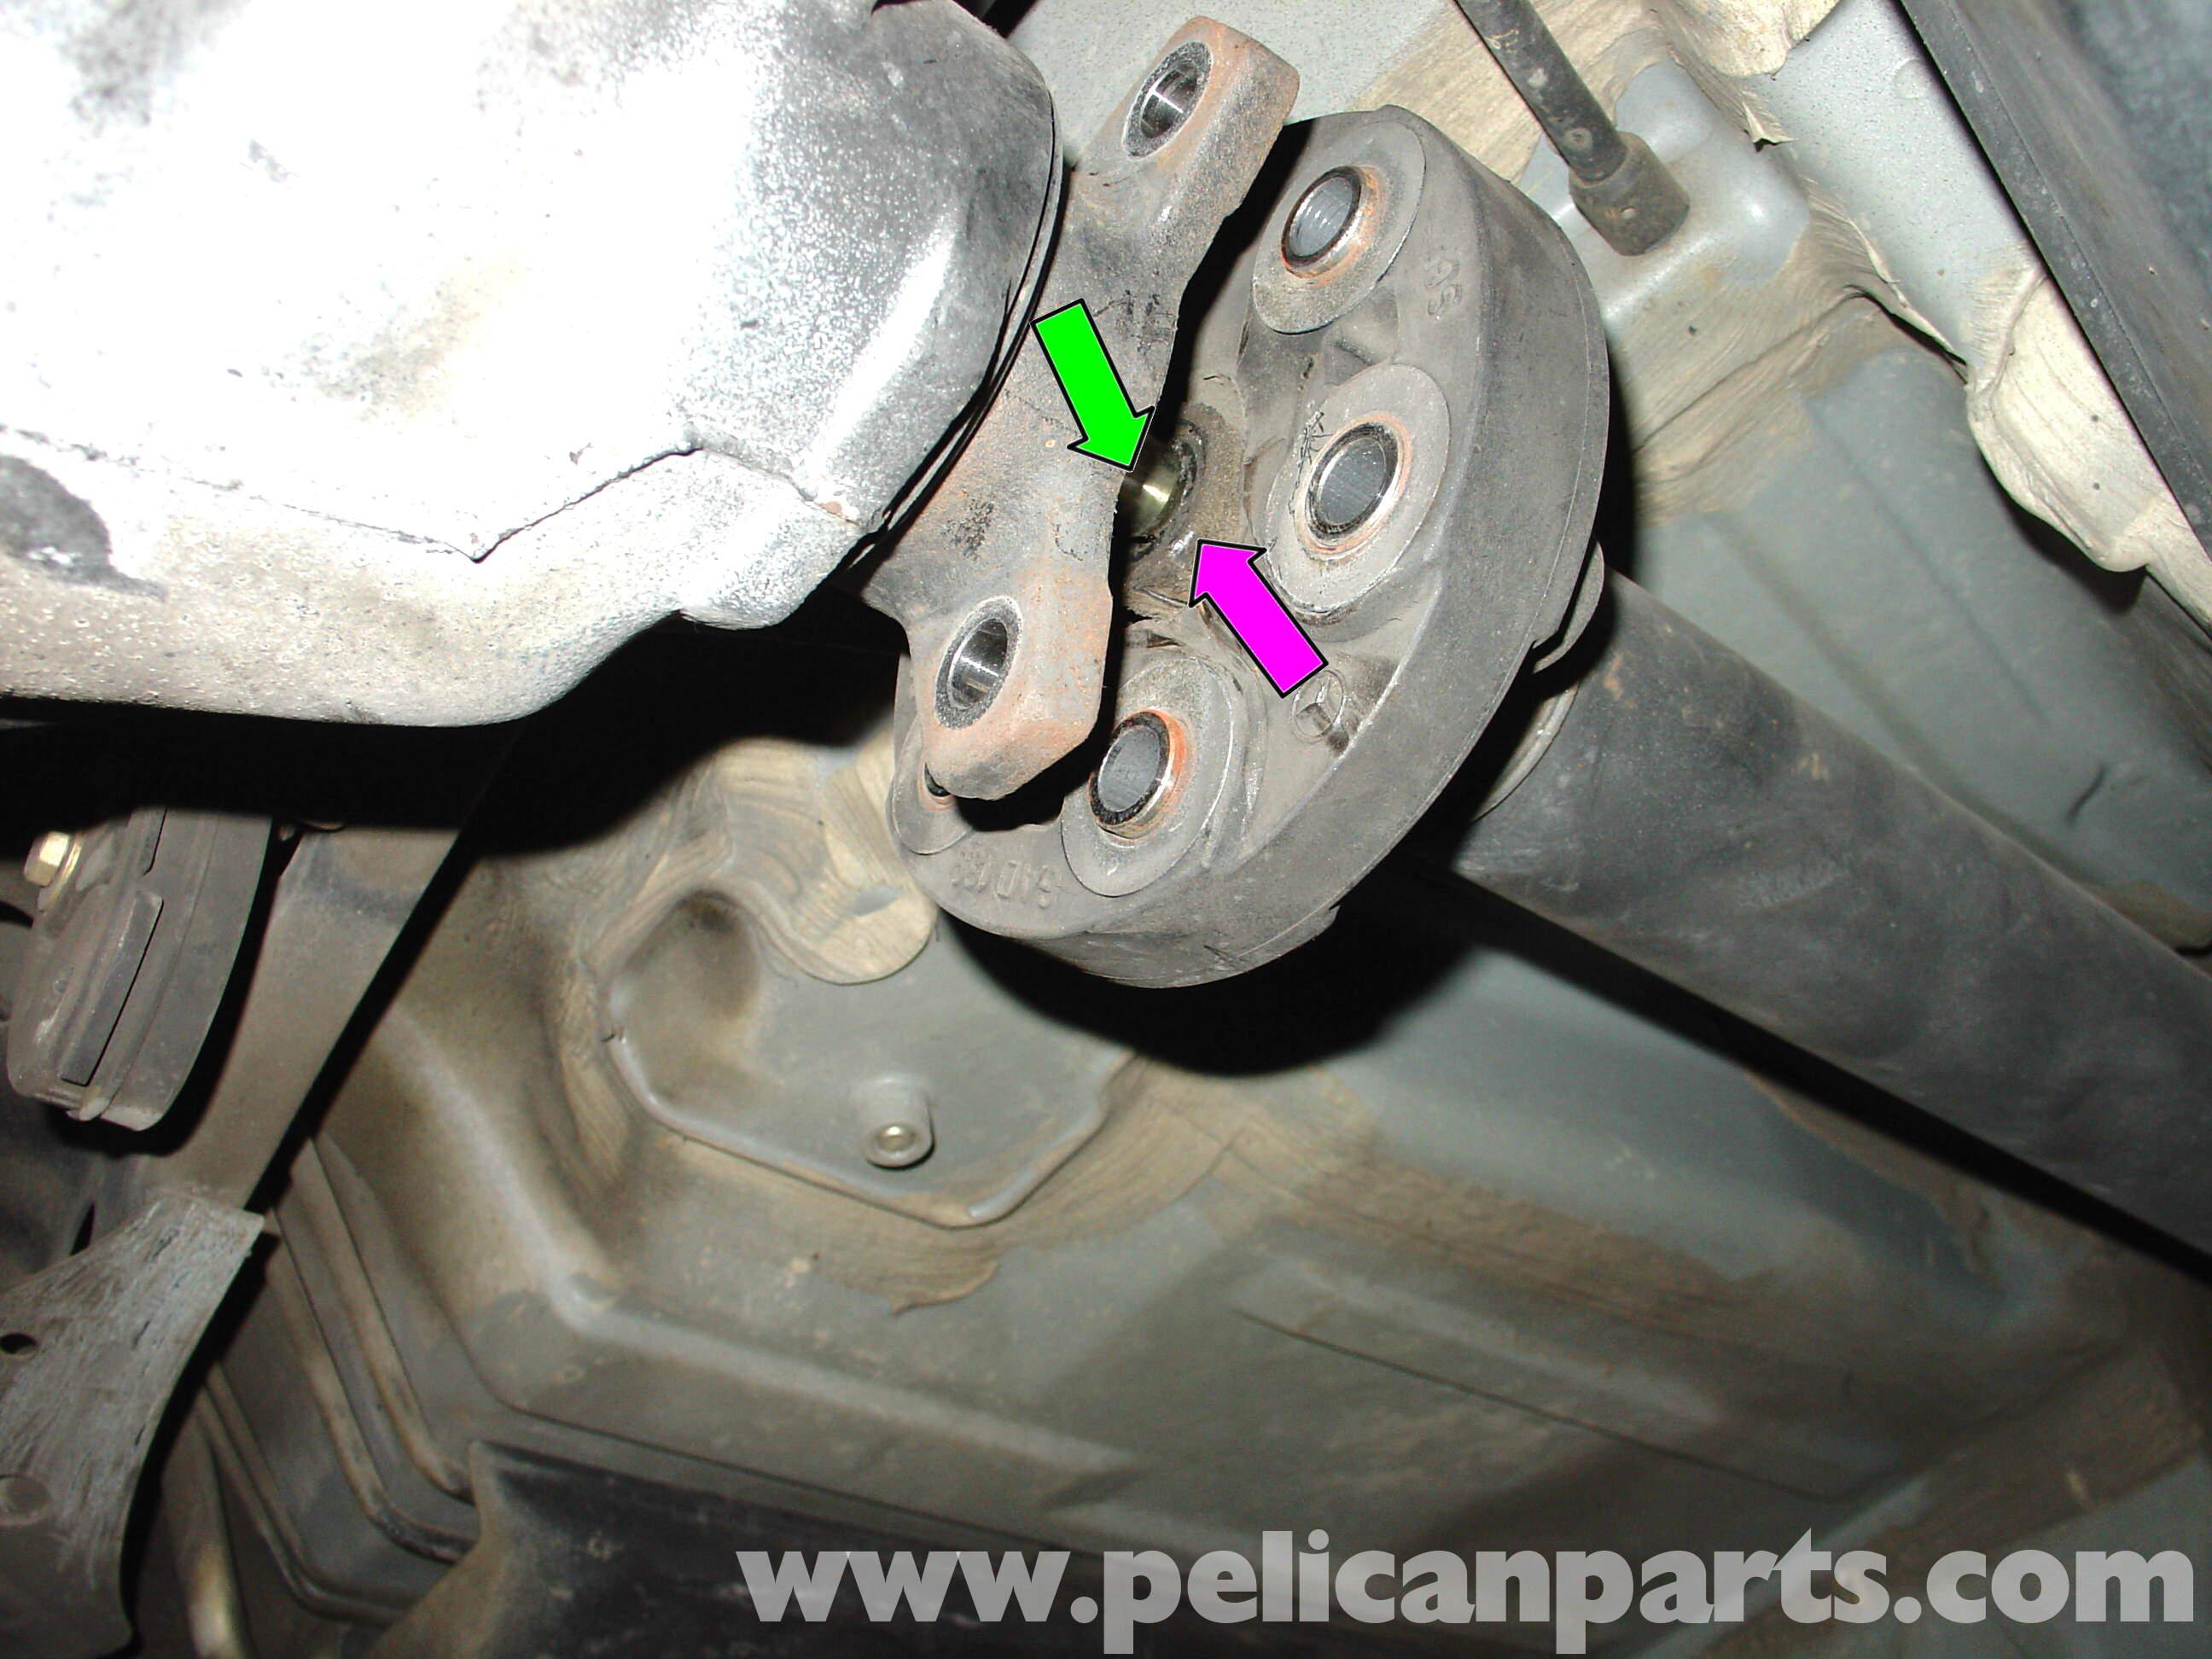 C280 Mercedes Front Suspension Diagram Electrical Wiring Benz C230 Kompressor Engine W210 Flex Disc Replacement 1996 03 E320 Problems